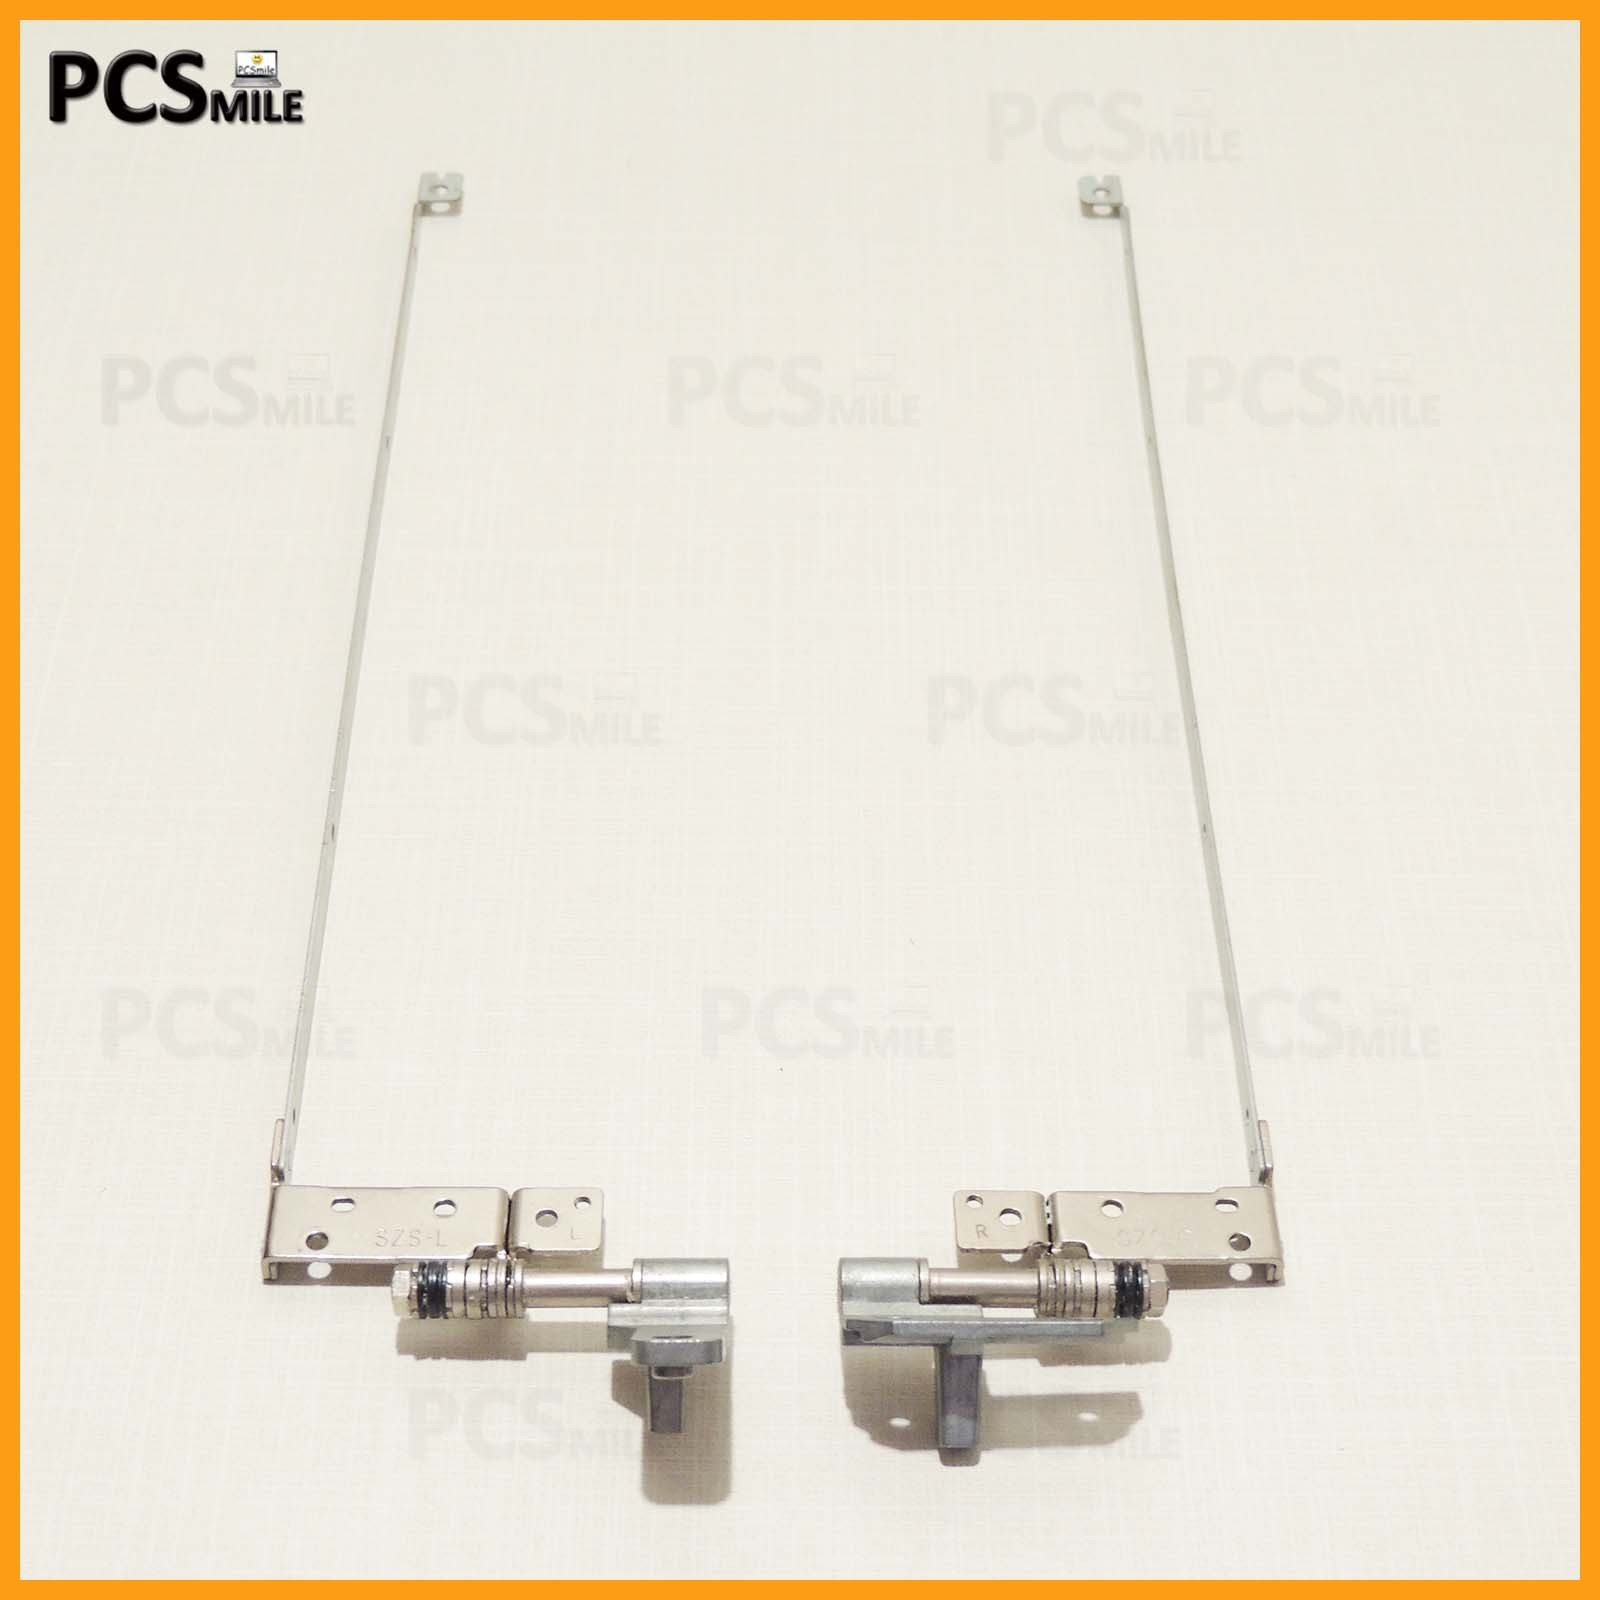 Cerniere Fujitsu Siemens Amilo PA 3553 MS2242 34.4H701002 34.4H702002